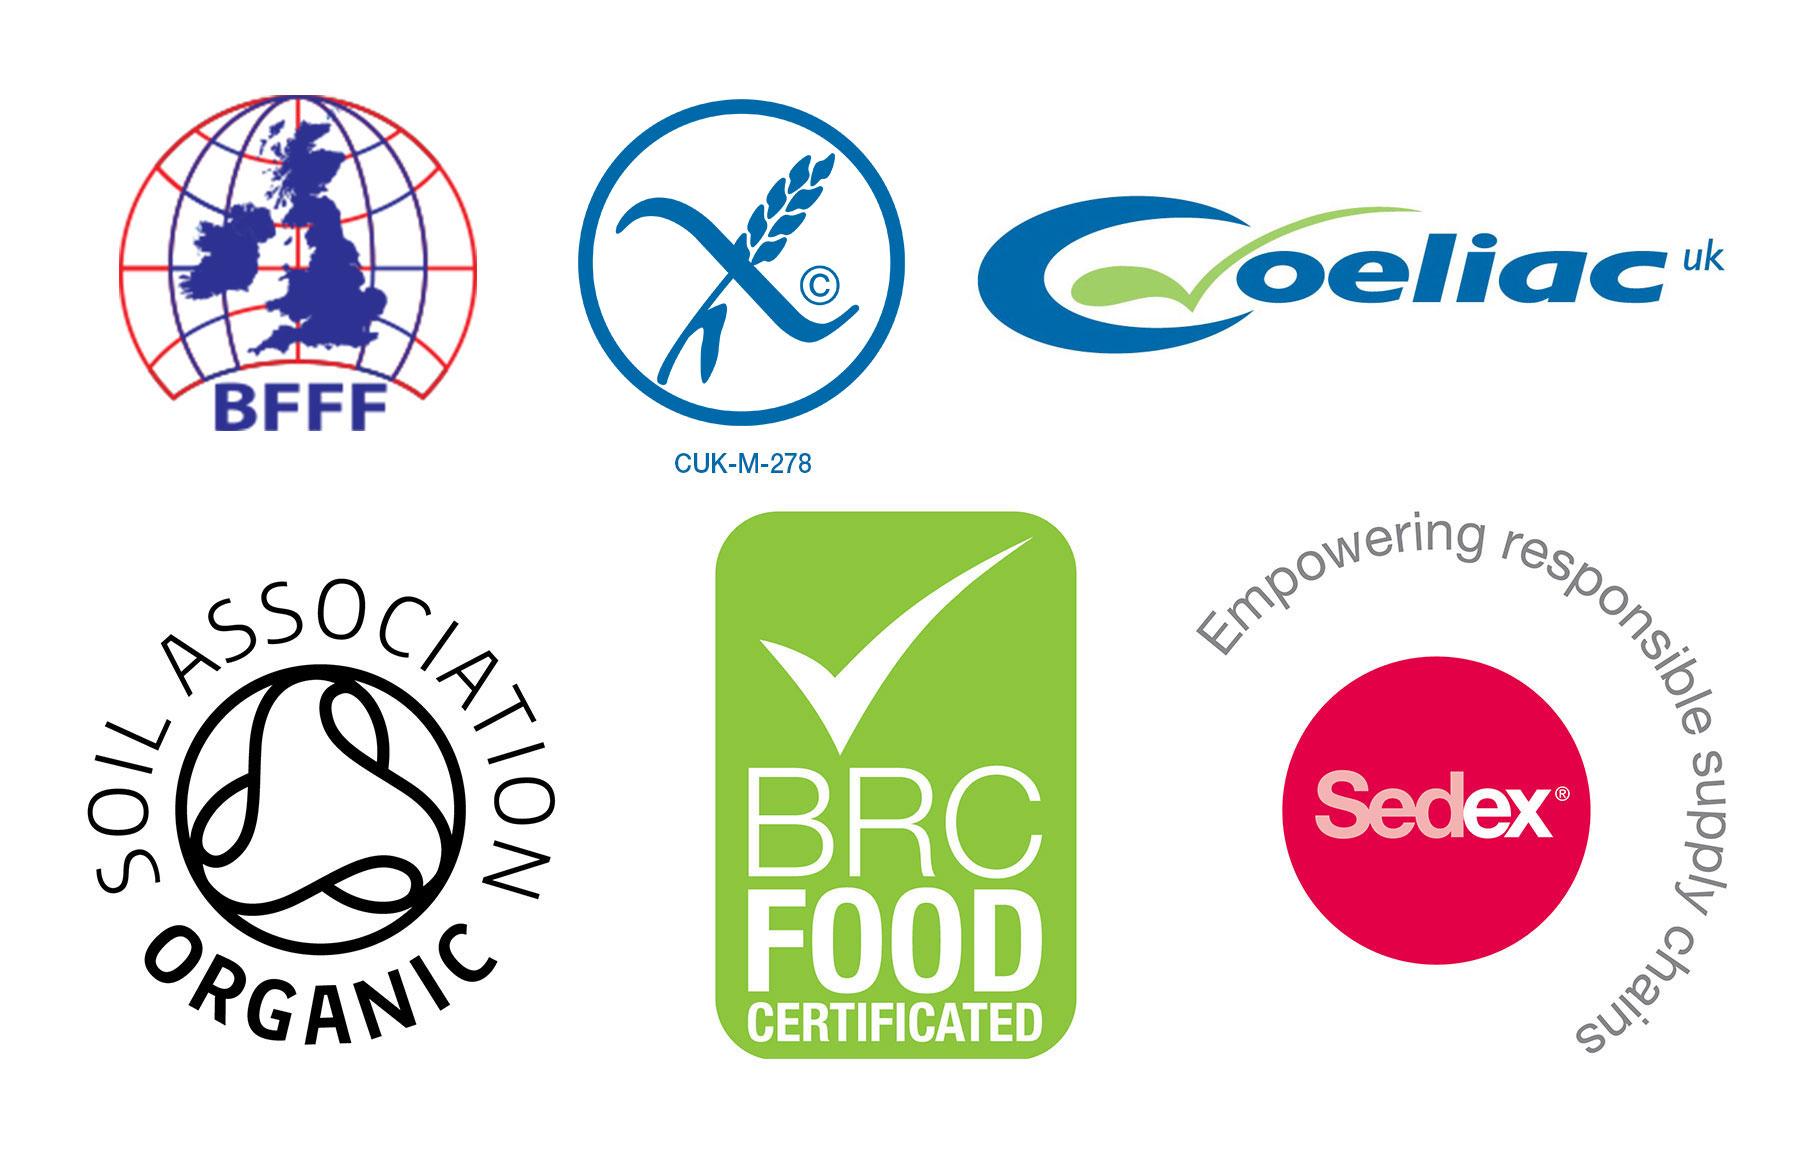 Food Logos Plus Bffff Code